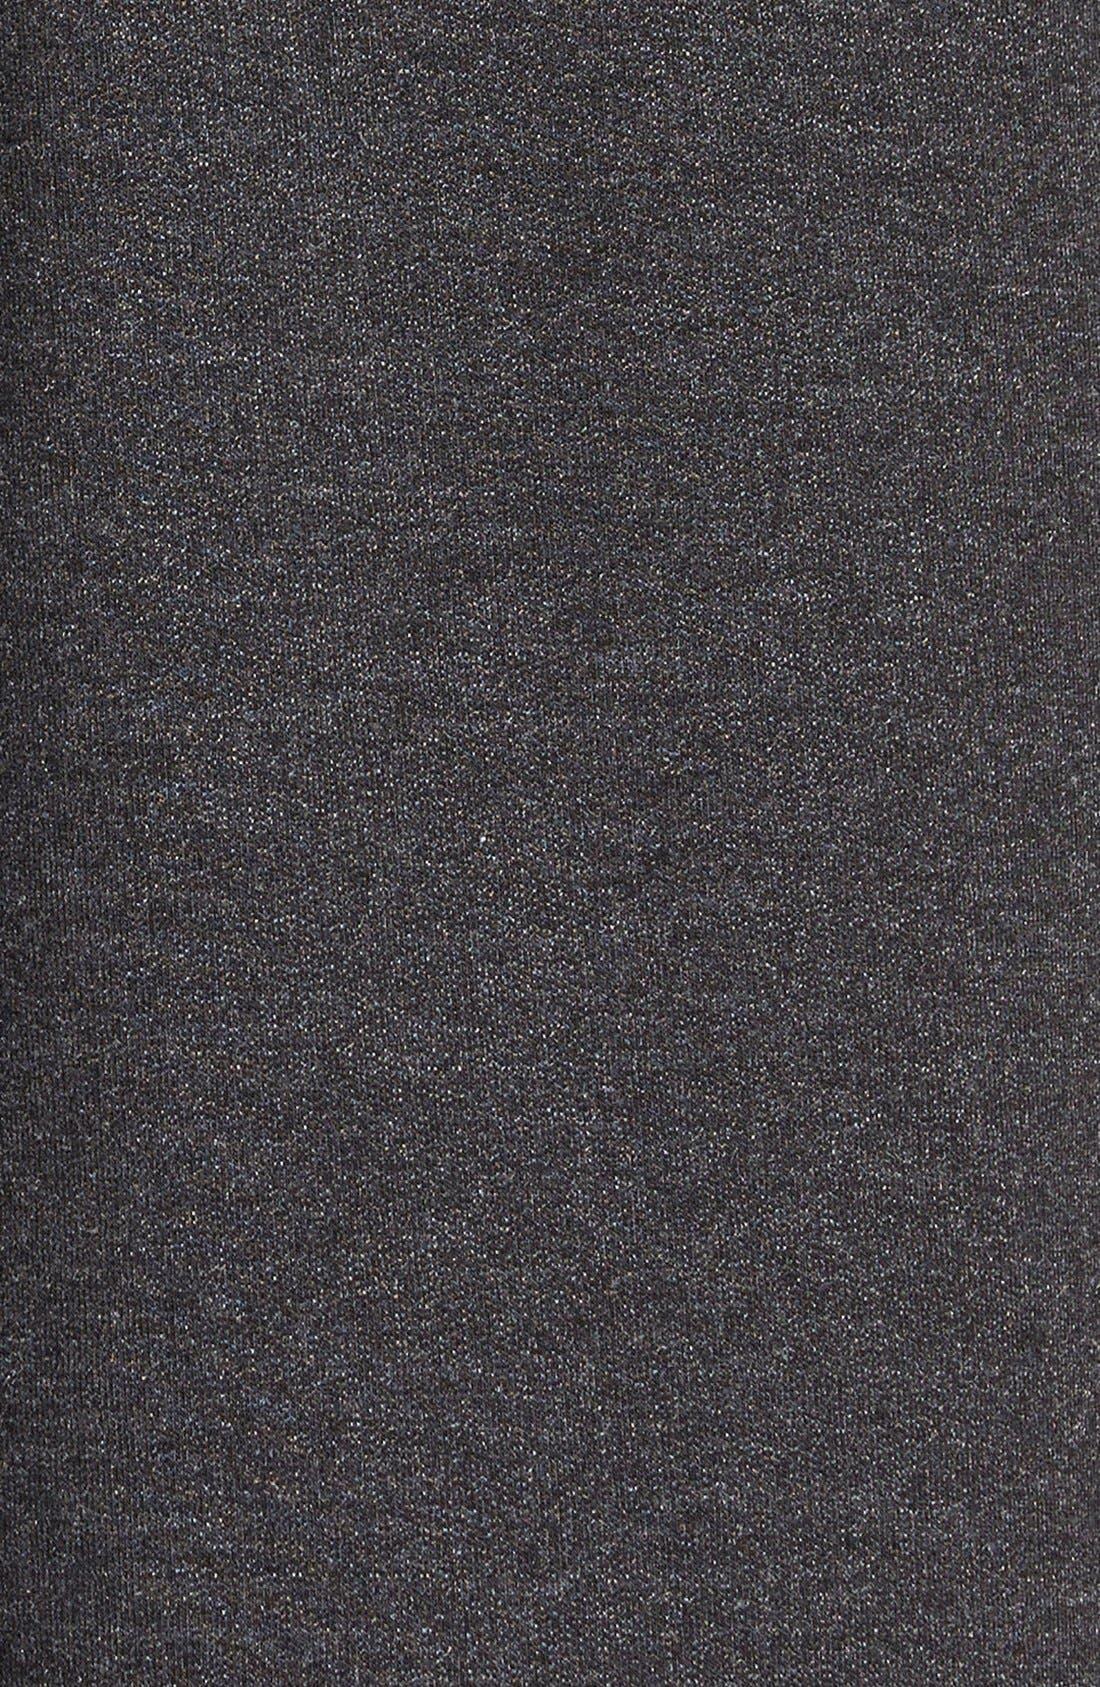 NIKE,                             Dri-FIT Touch Fleece Shorts,                             Alternate thumbnail 3, color,                             010